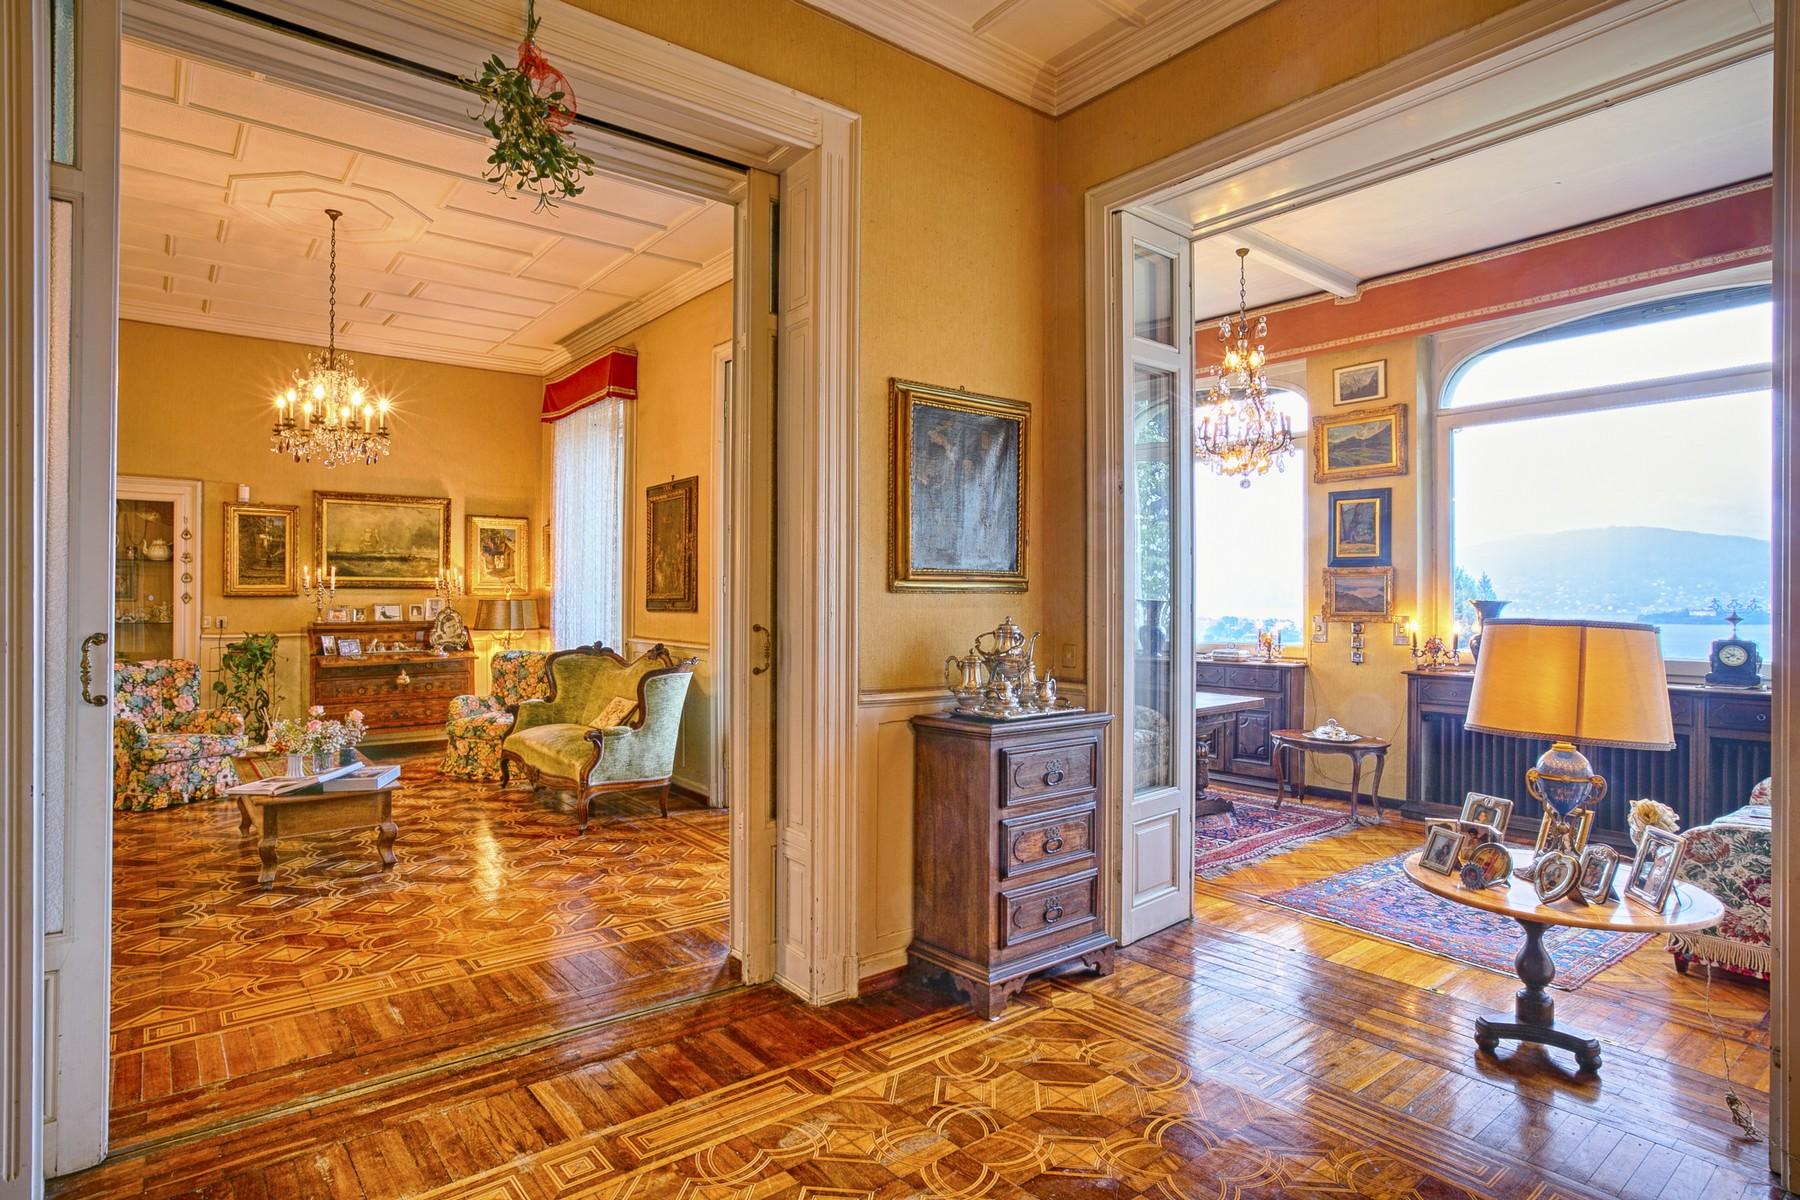 Villa in Vendita a Stresa: 5 locali, 800 mq - Foto 20